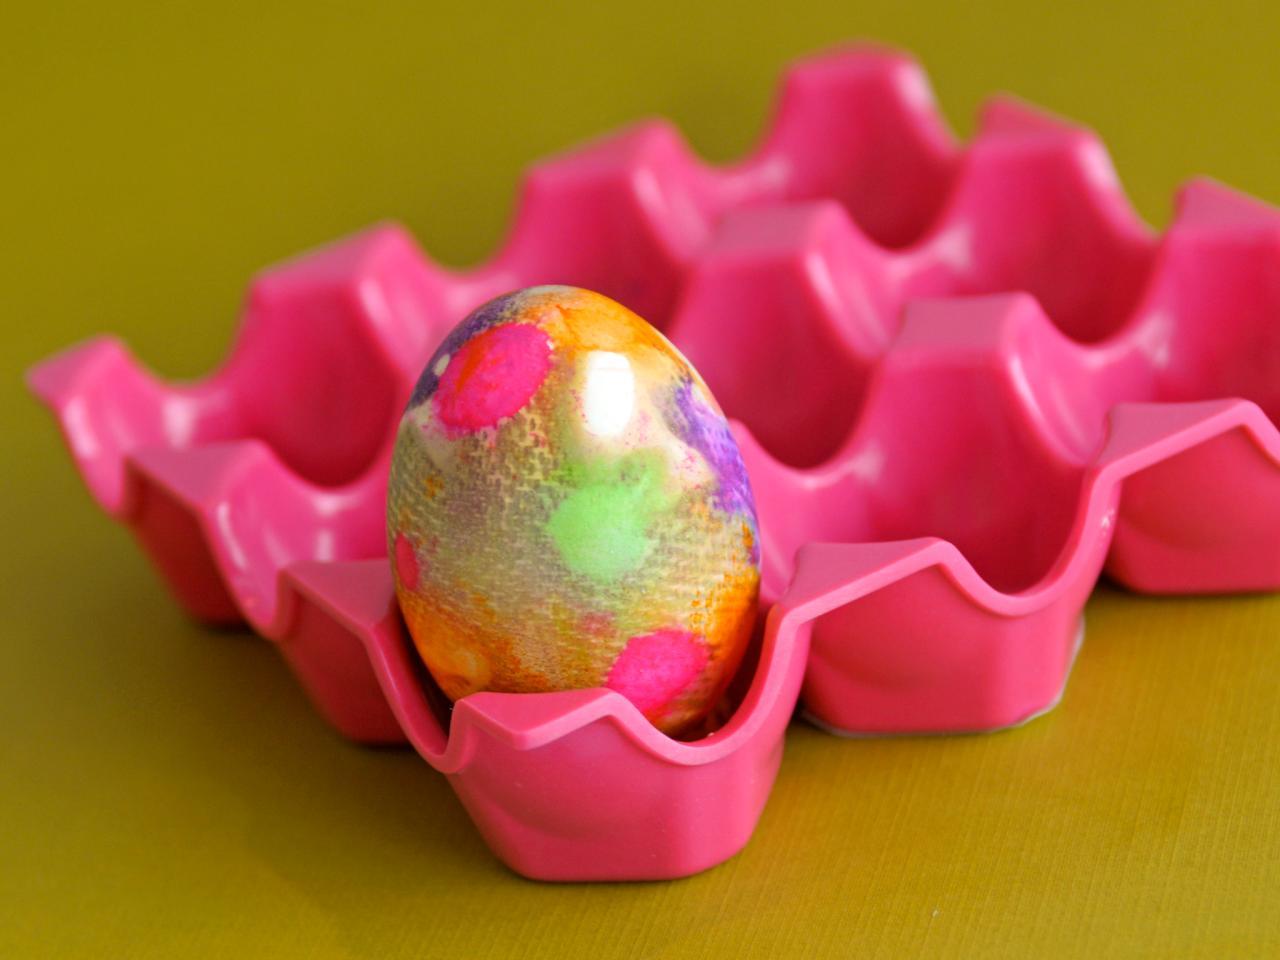 15 Easter Egg Decorating Ideas That Go Beyond Dye Hgtv S